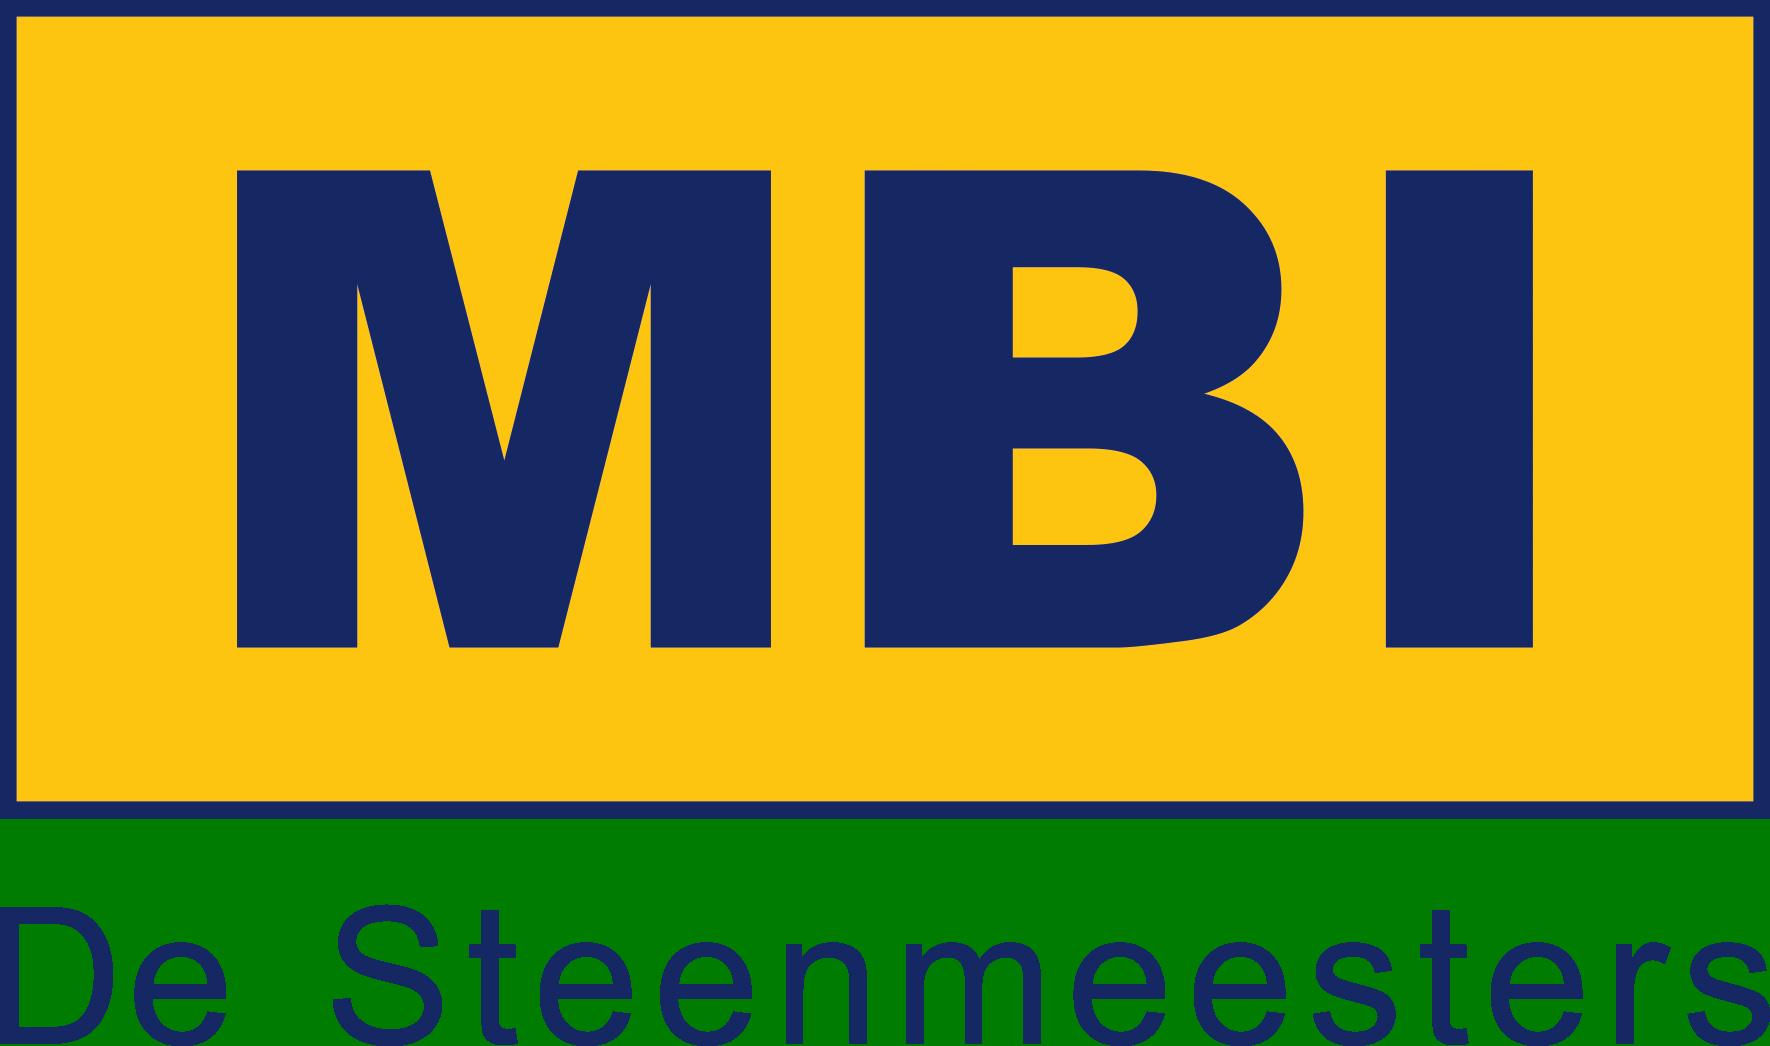 LOGO MBI 2015 original l 1 1 1